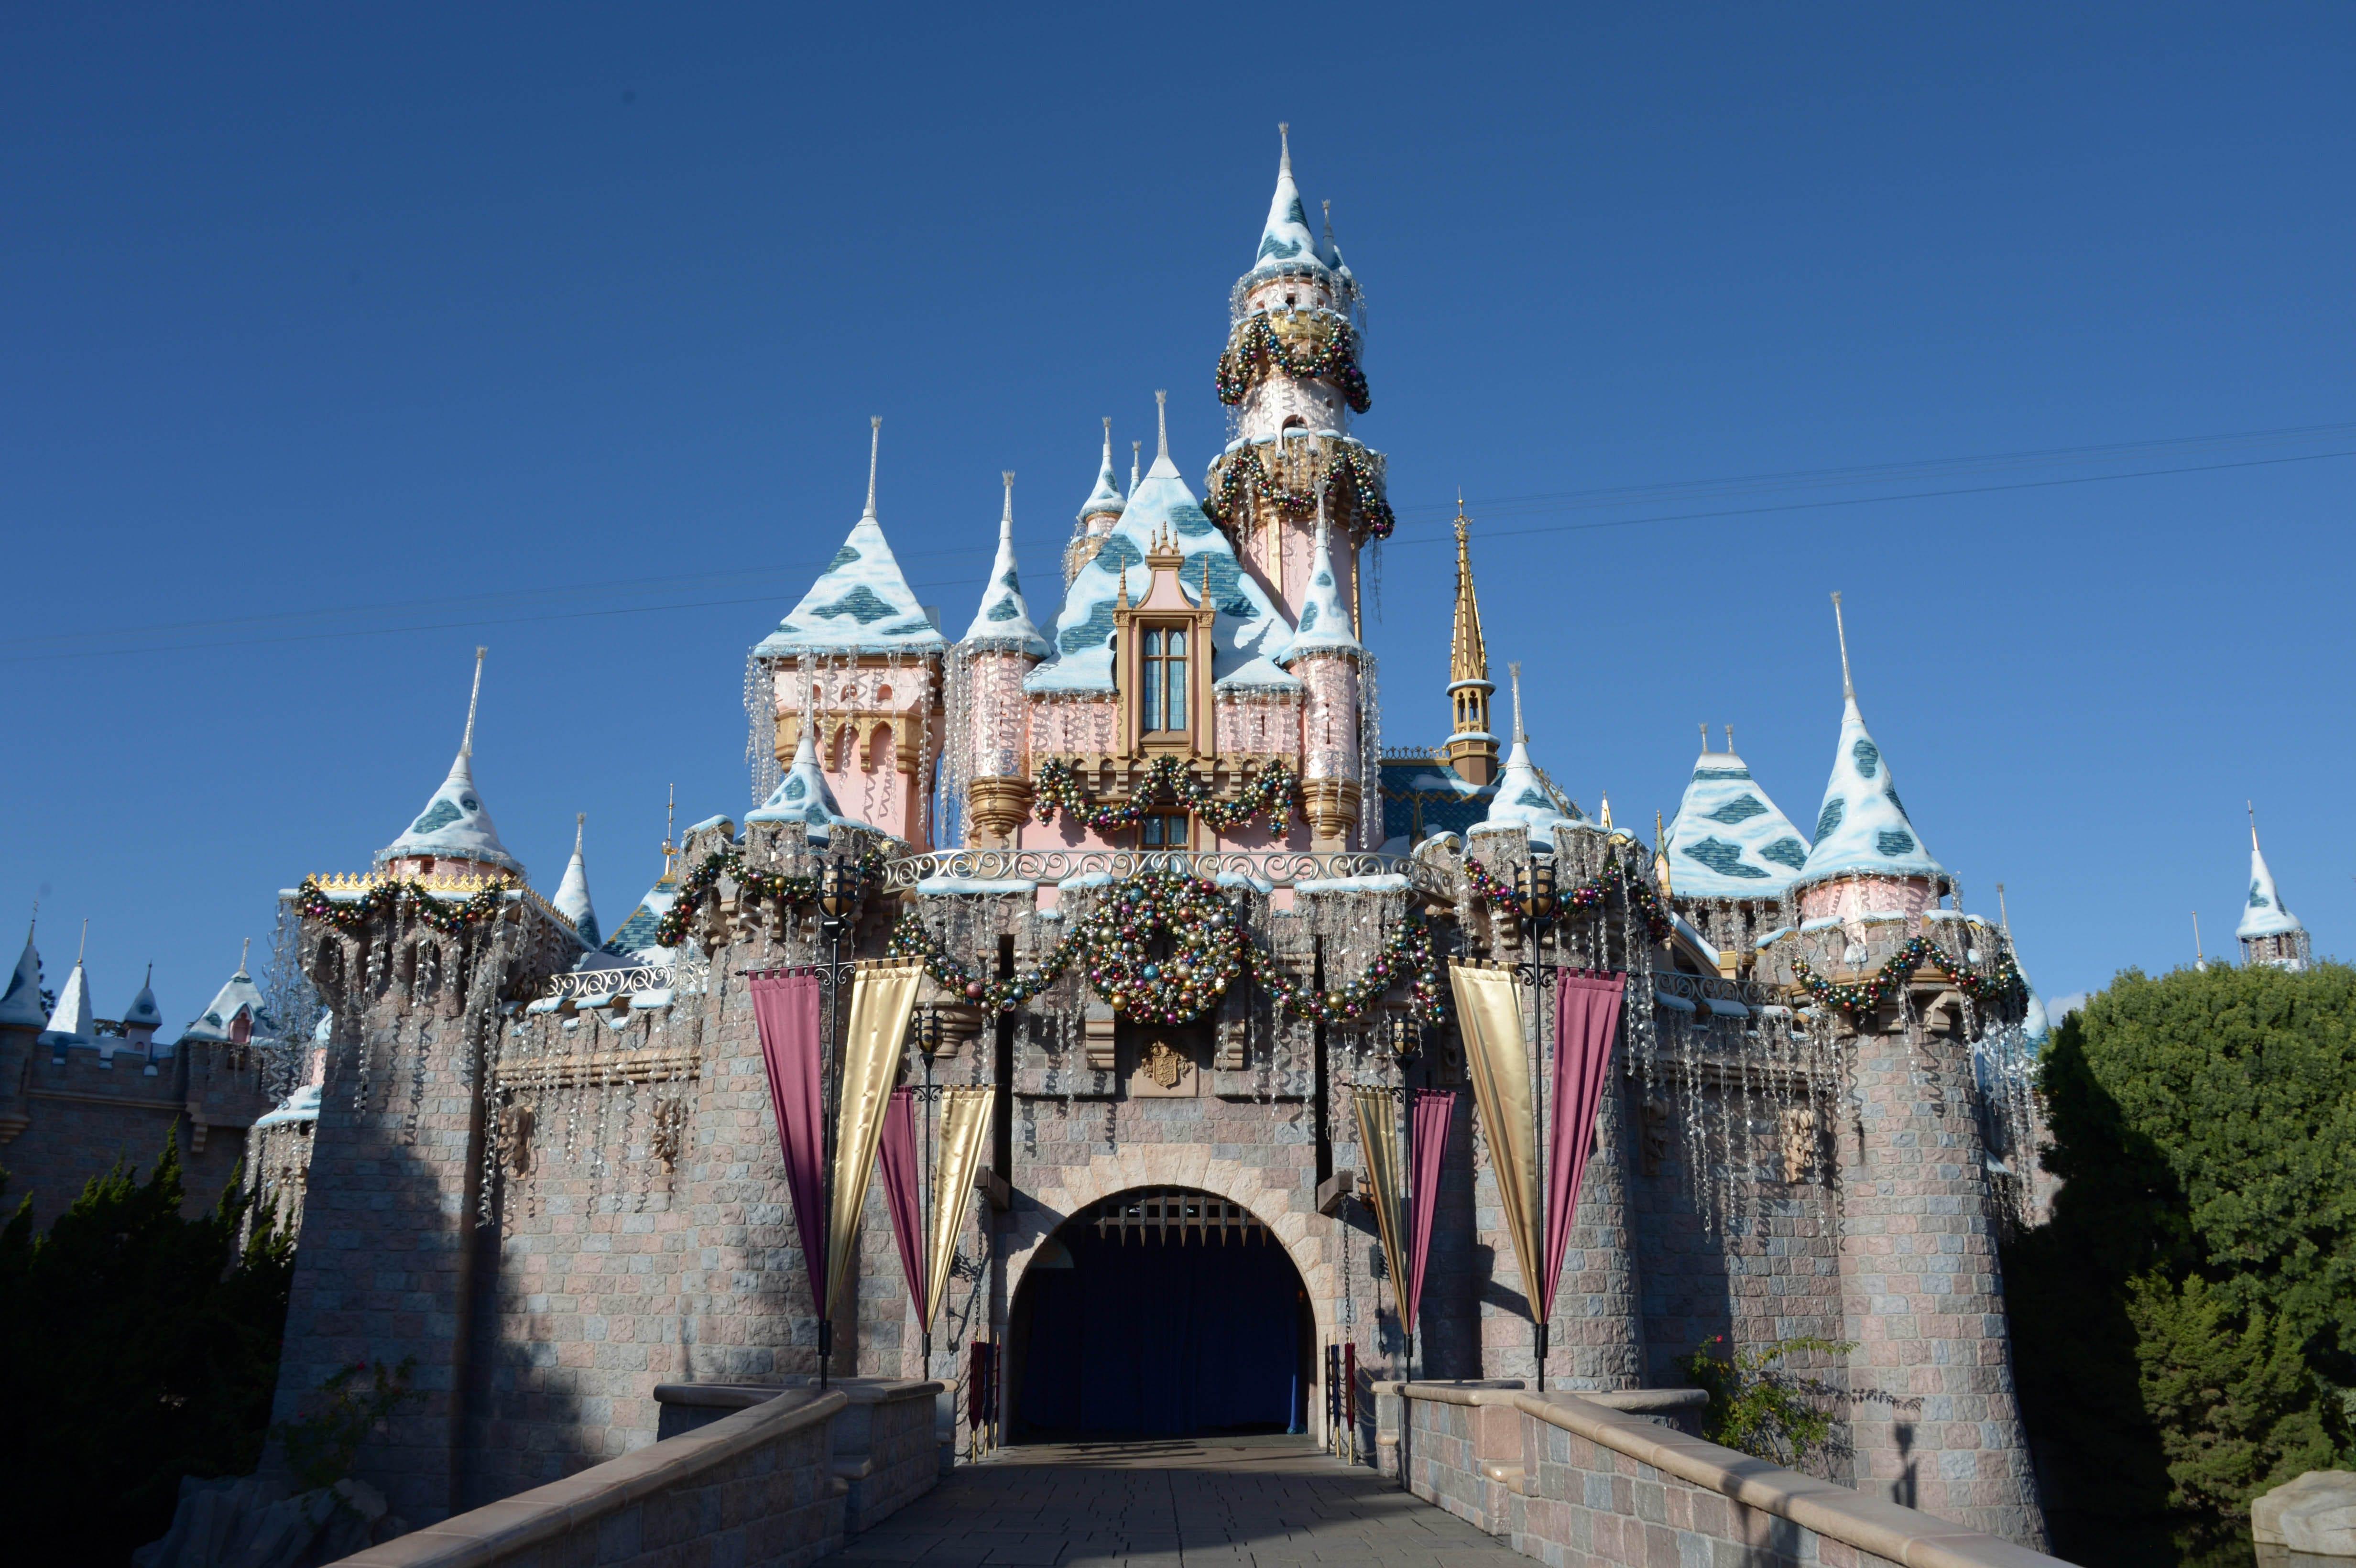 Eight ways to save as theme park ticket prices soar | USA Today